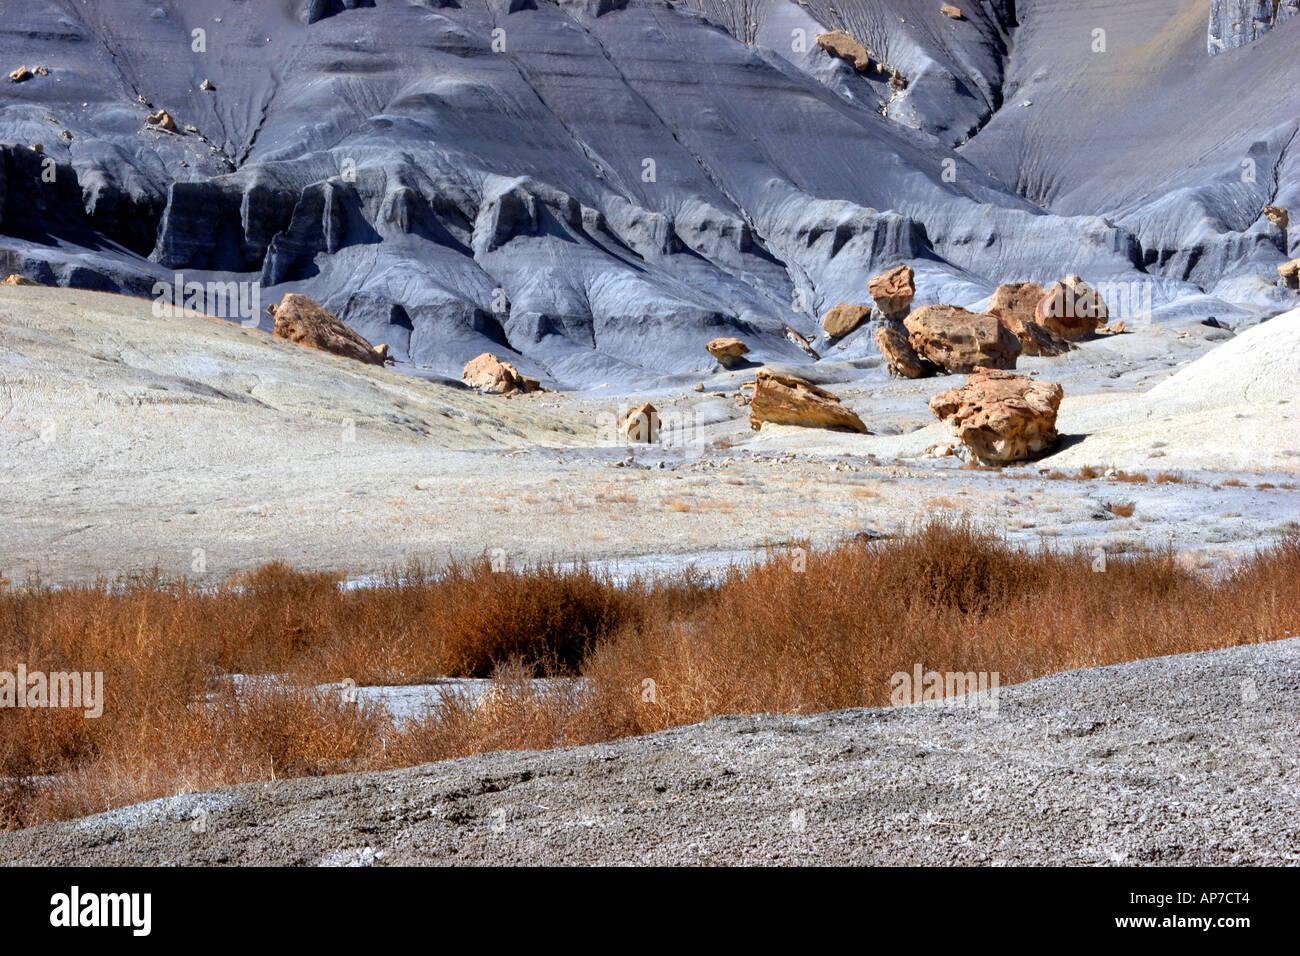 Banc de mamelon badlands, Glen Canyon, Utah Banque D'Images